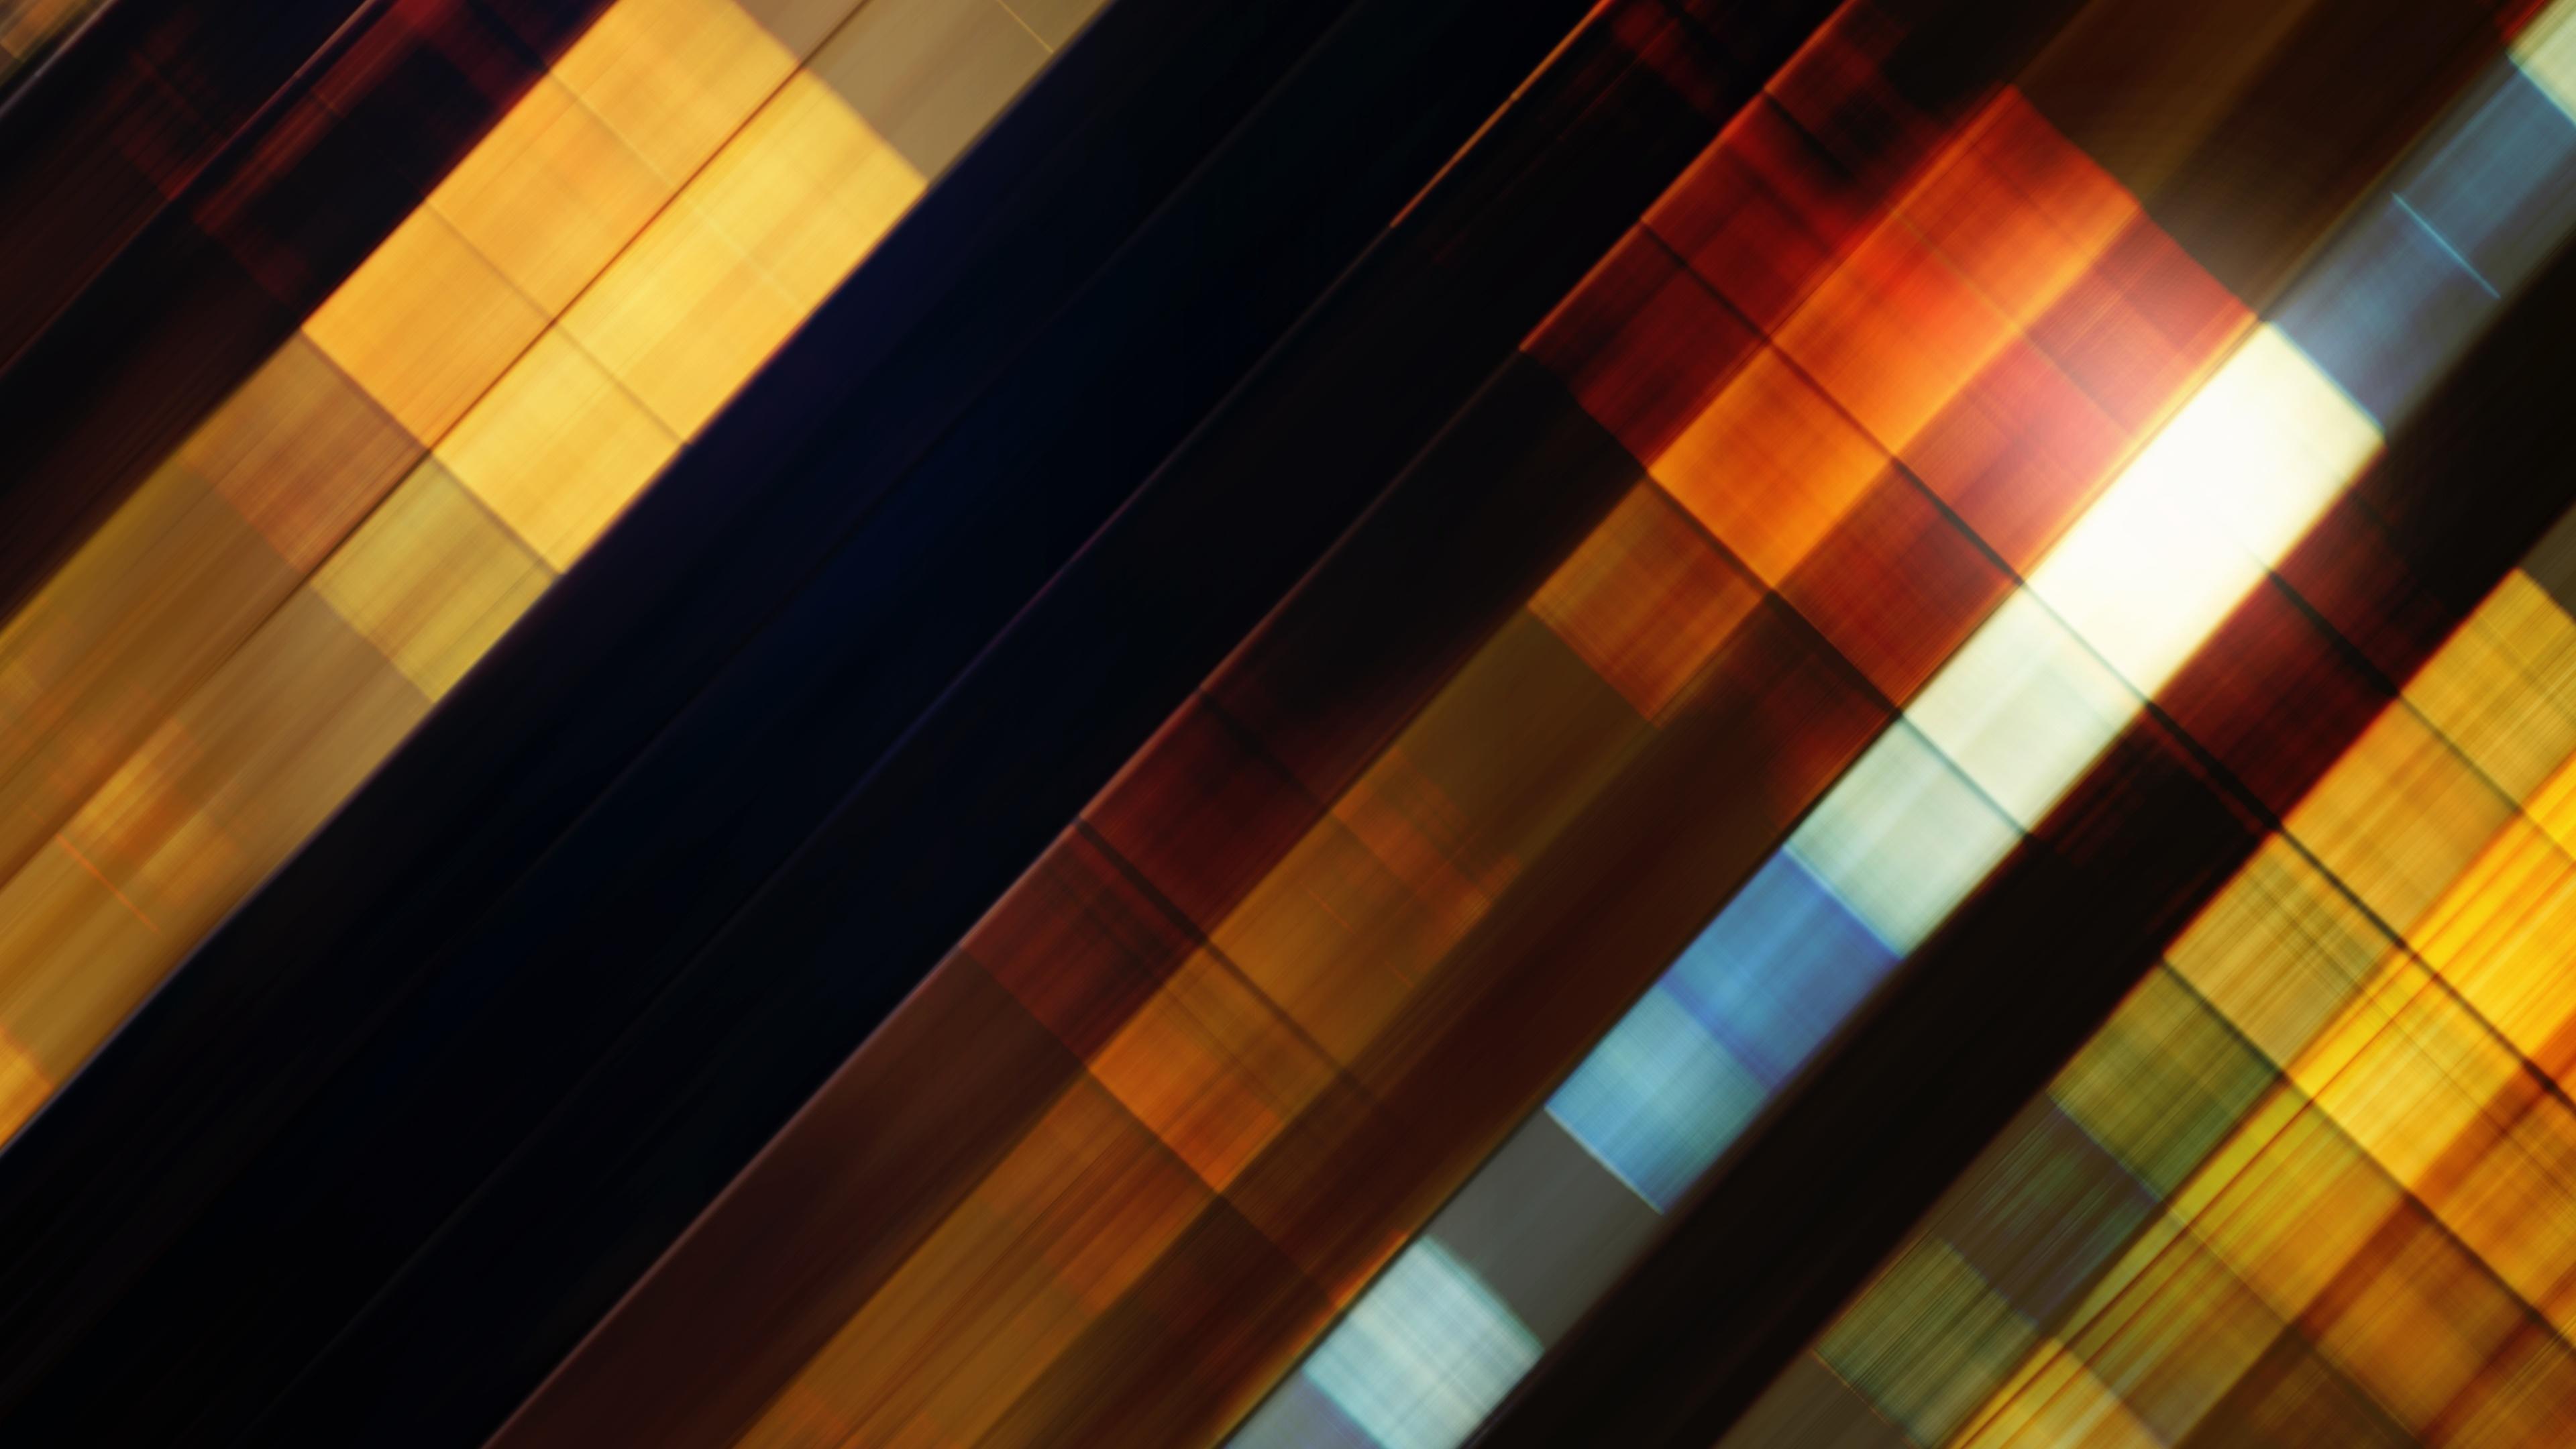 abstract texture digital art 5k 1539371270 - Abstract Texture Digital Art 5k - texture wallpapers, hd-wallpapers, digital art wallpapers, abstract wallpapers, 5k wallpapers, 4k-wallpapers